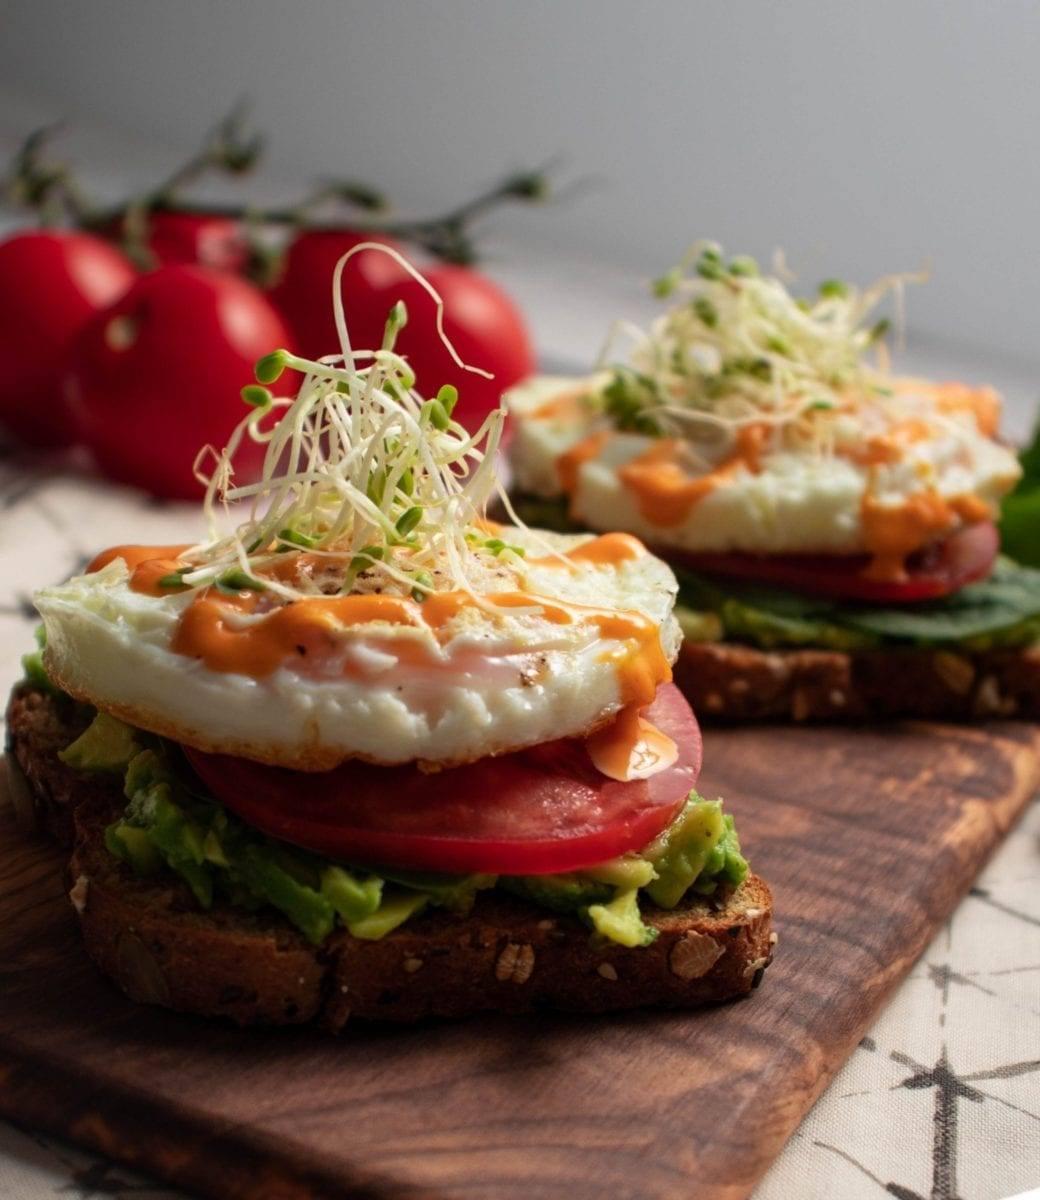 Sriracha Egg Toast